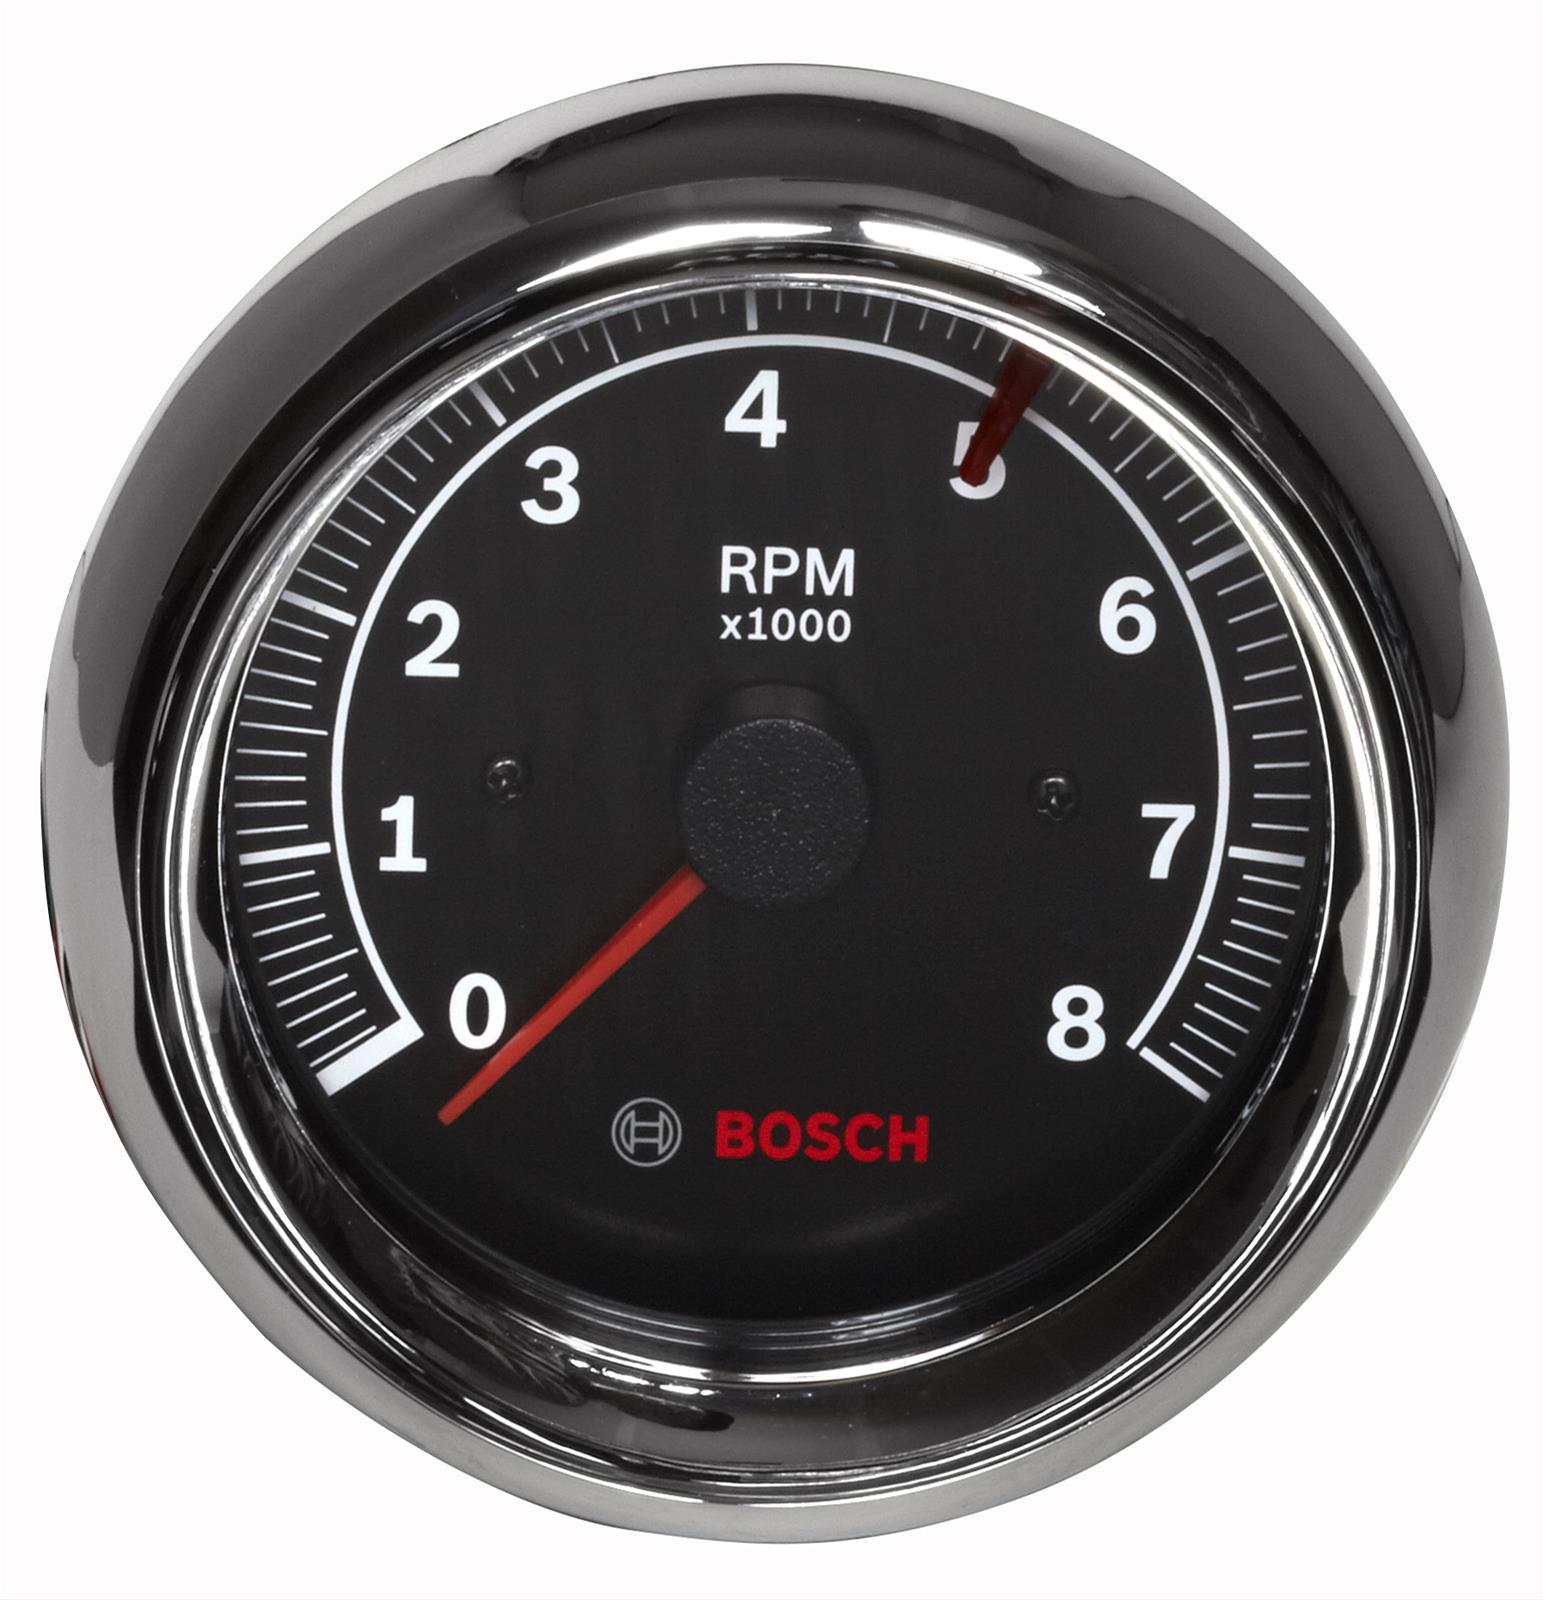 Bosch Sport Ii Tachometer Gauges Fst-7901